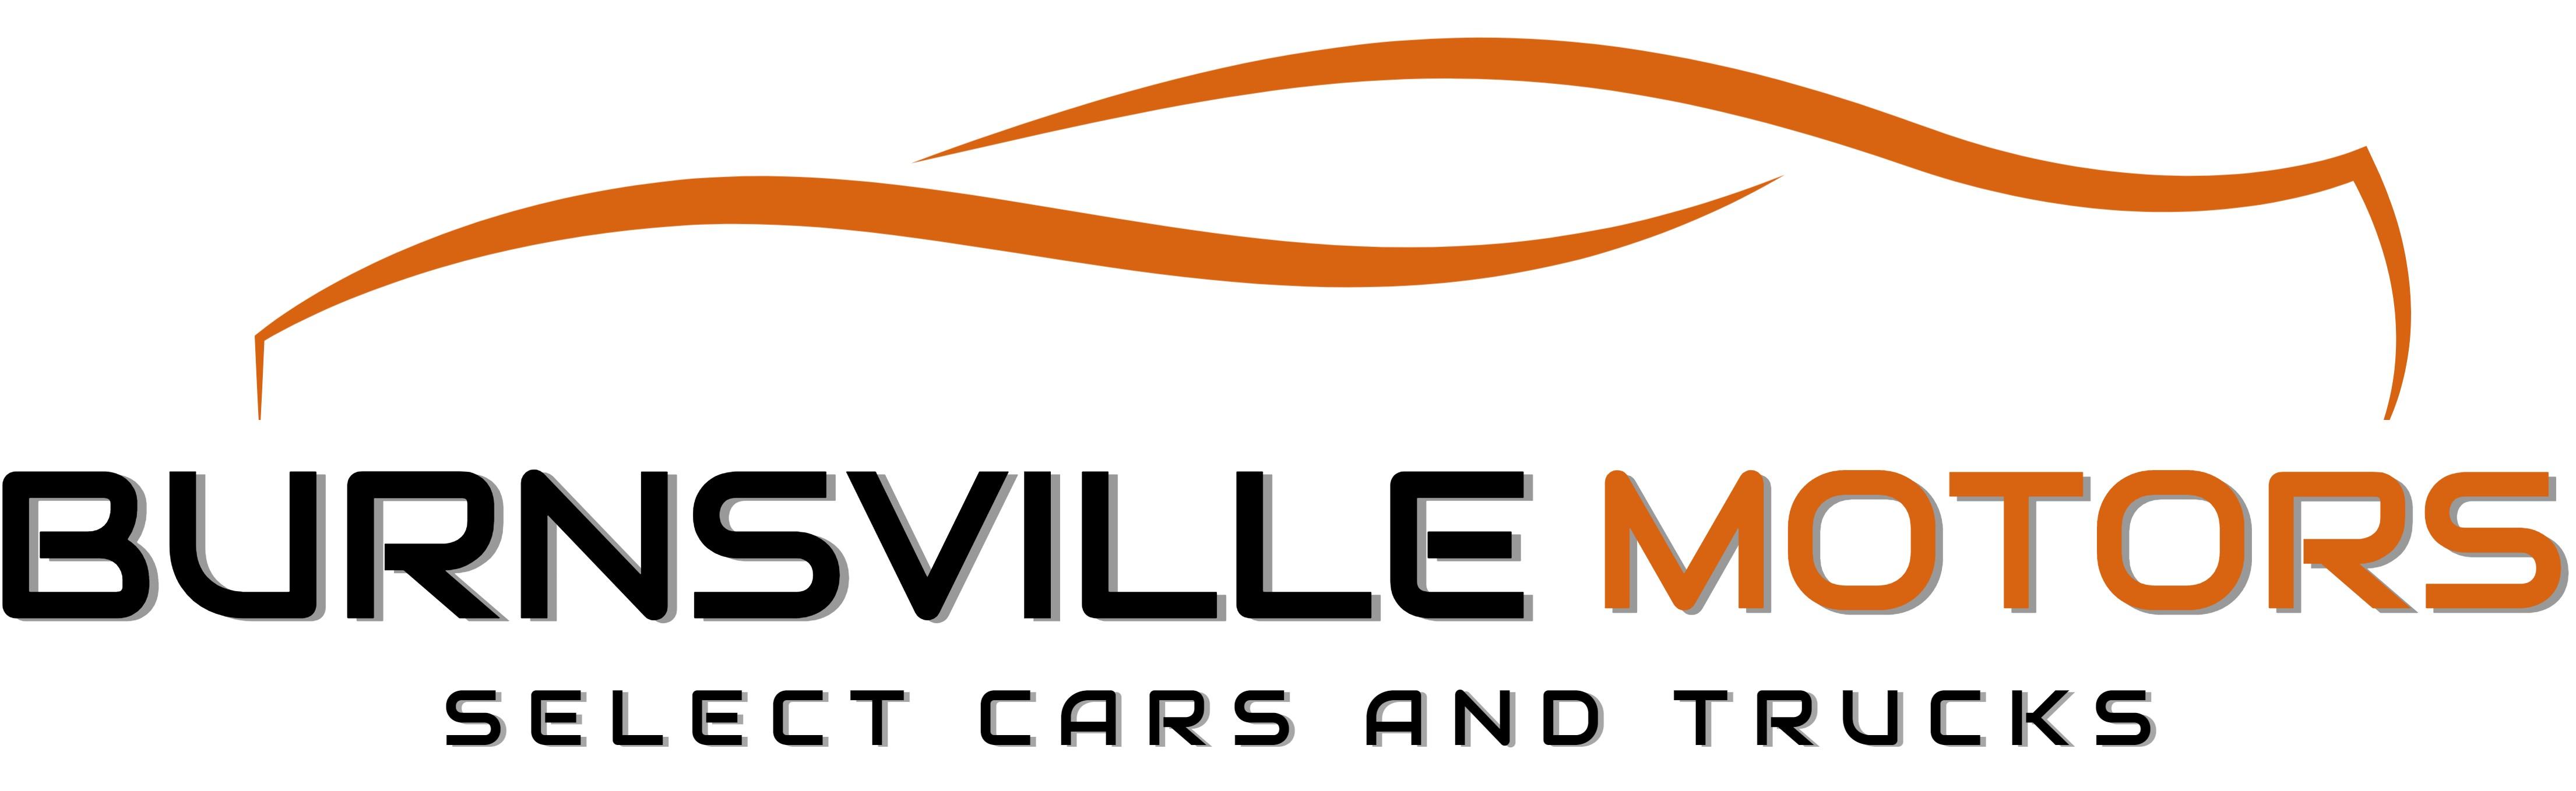 Burnsville Motors Logo